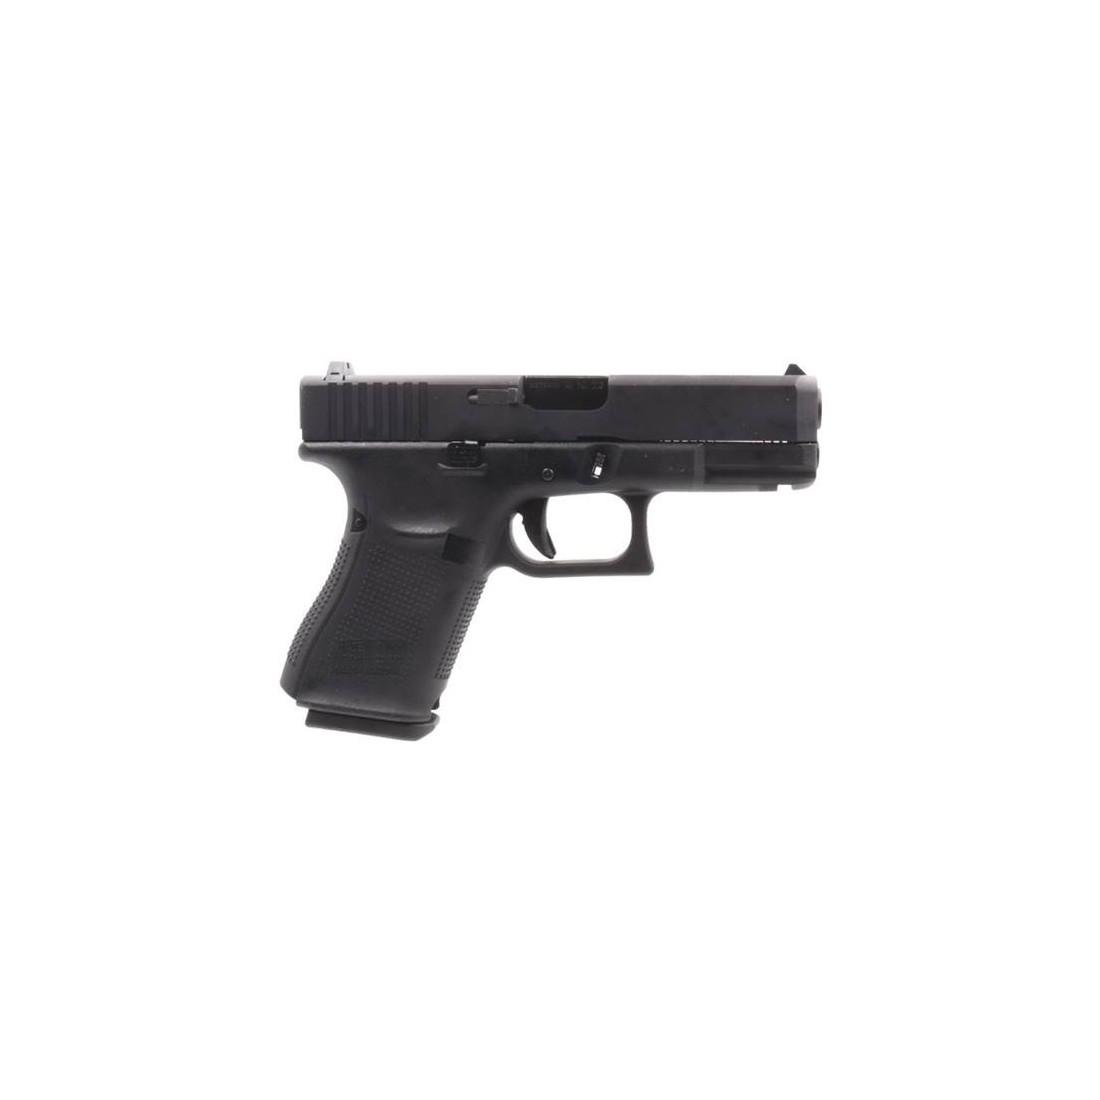 Pistola G19 Gen4 Metal Version GBB black [WE]